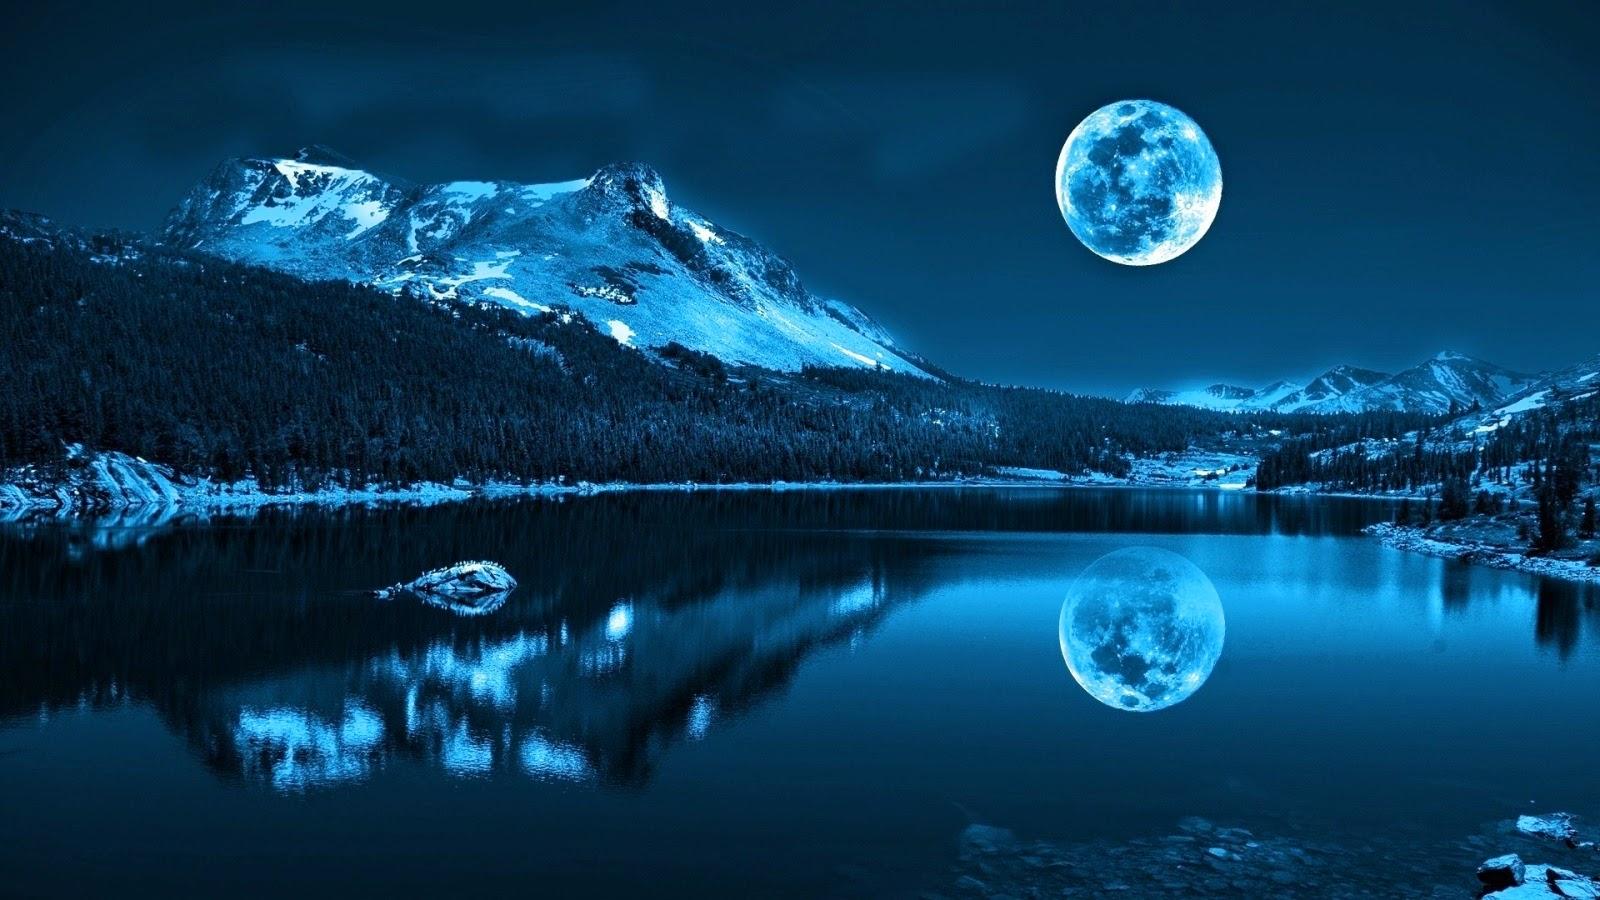 Full Moon HD Wallpaper